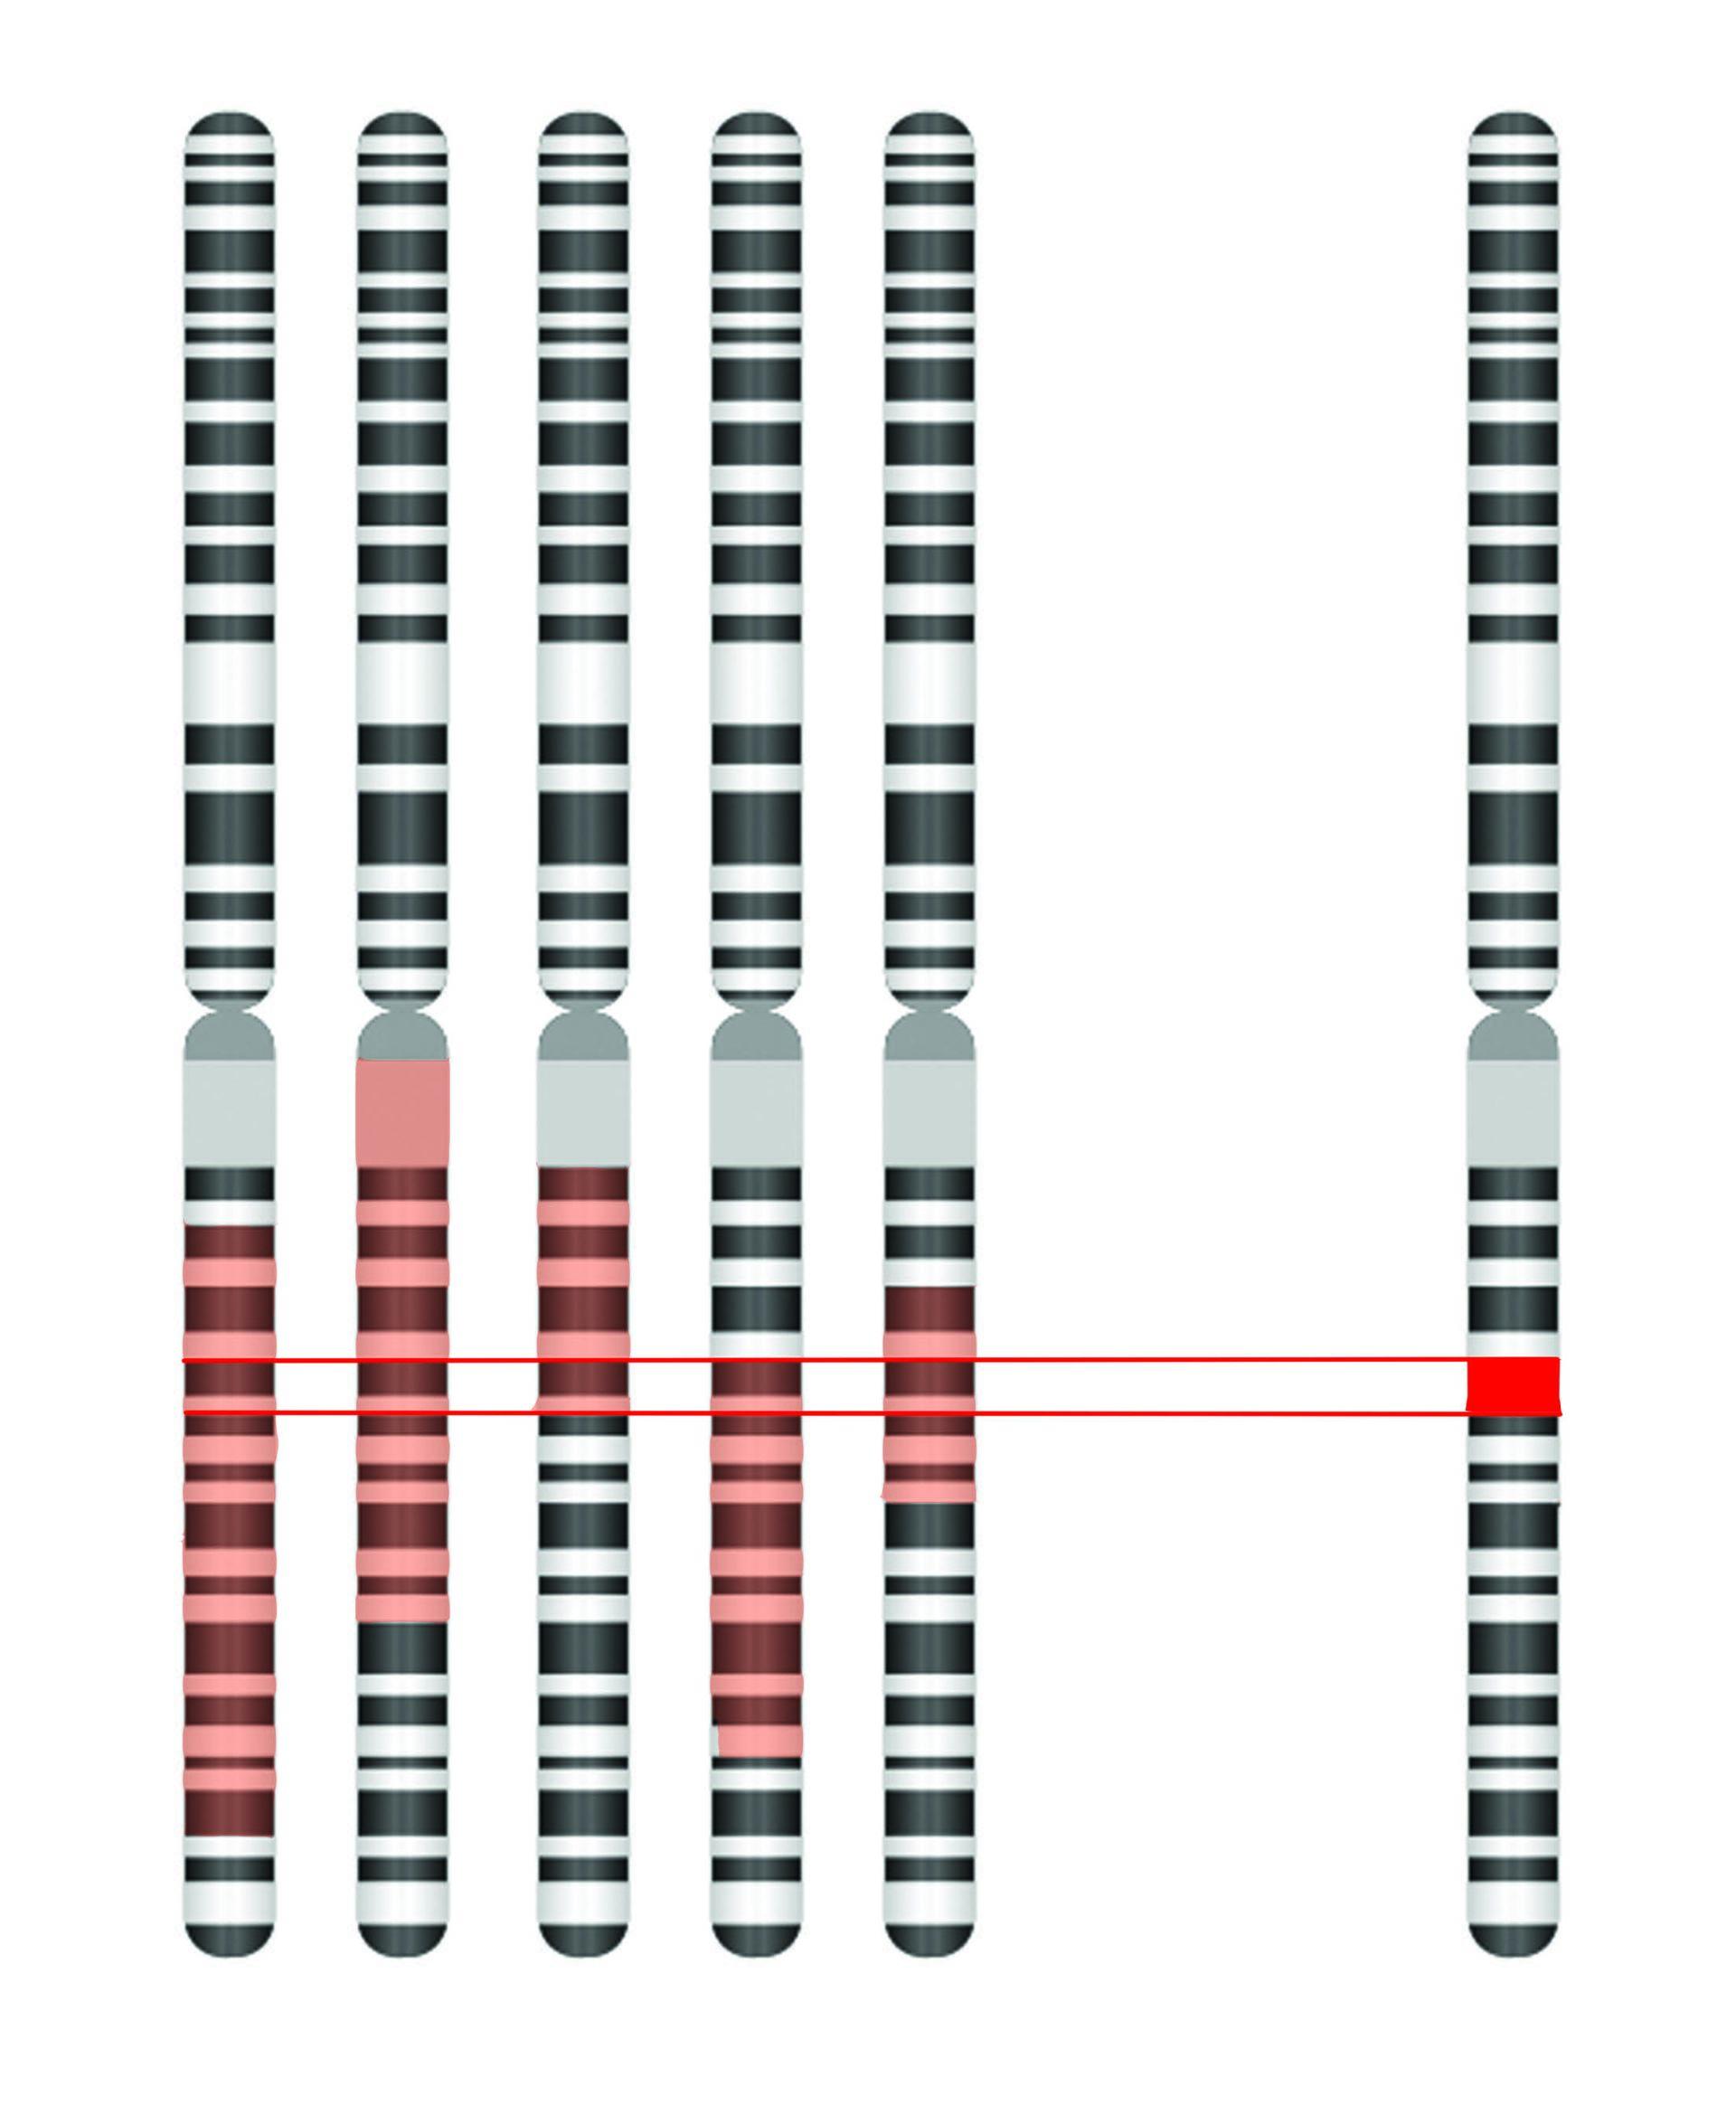 Dna Gene Genome Chromosome